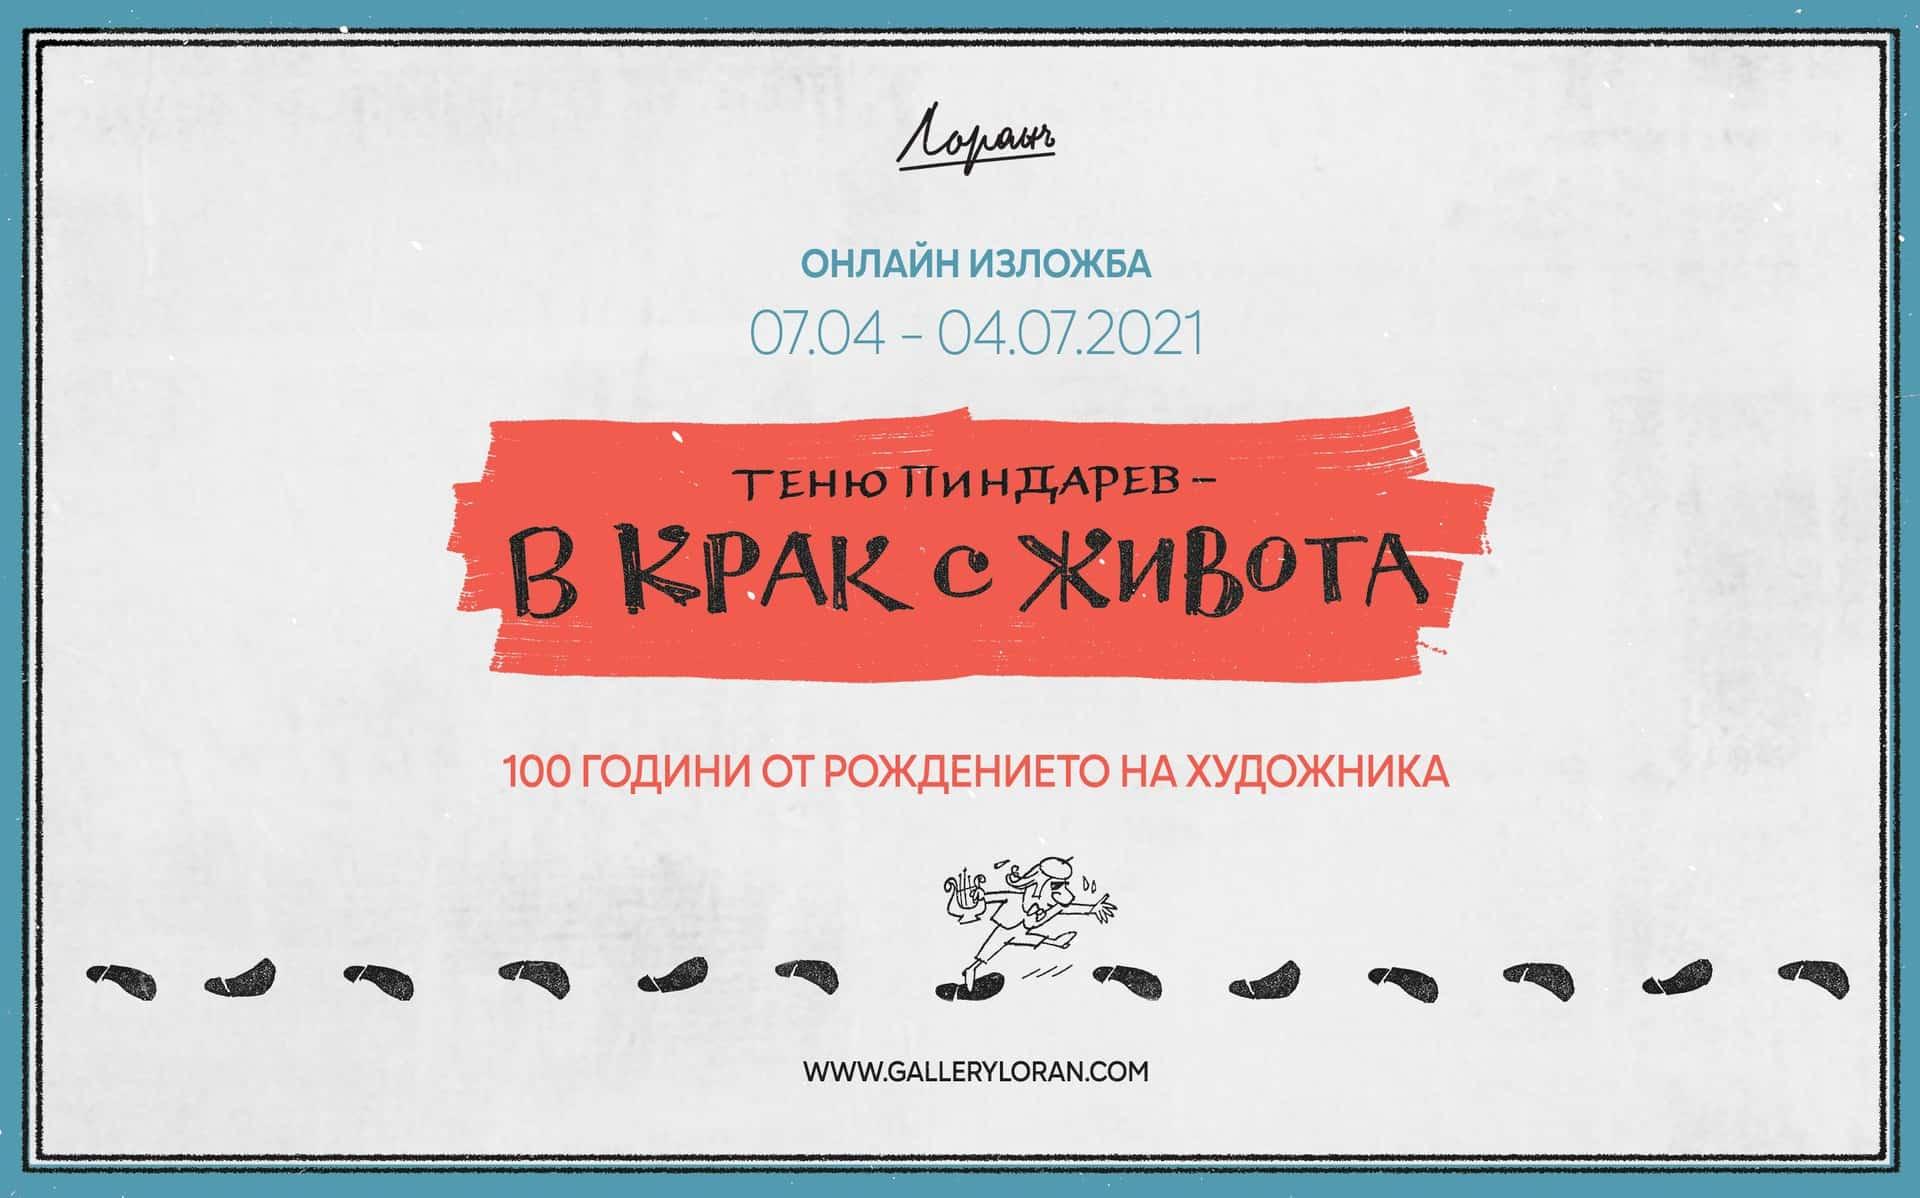 poster online izlojba3 (2)